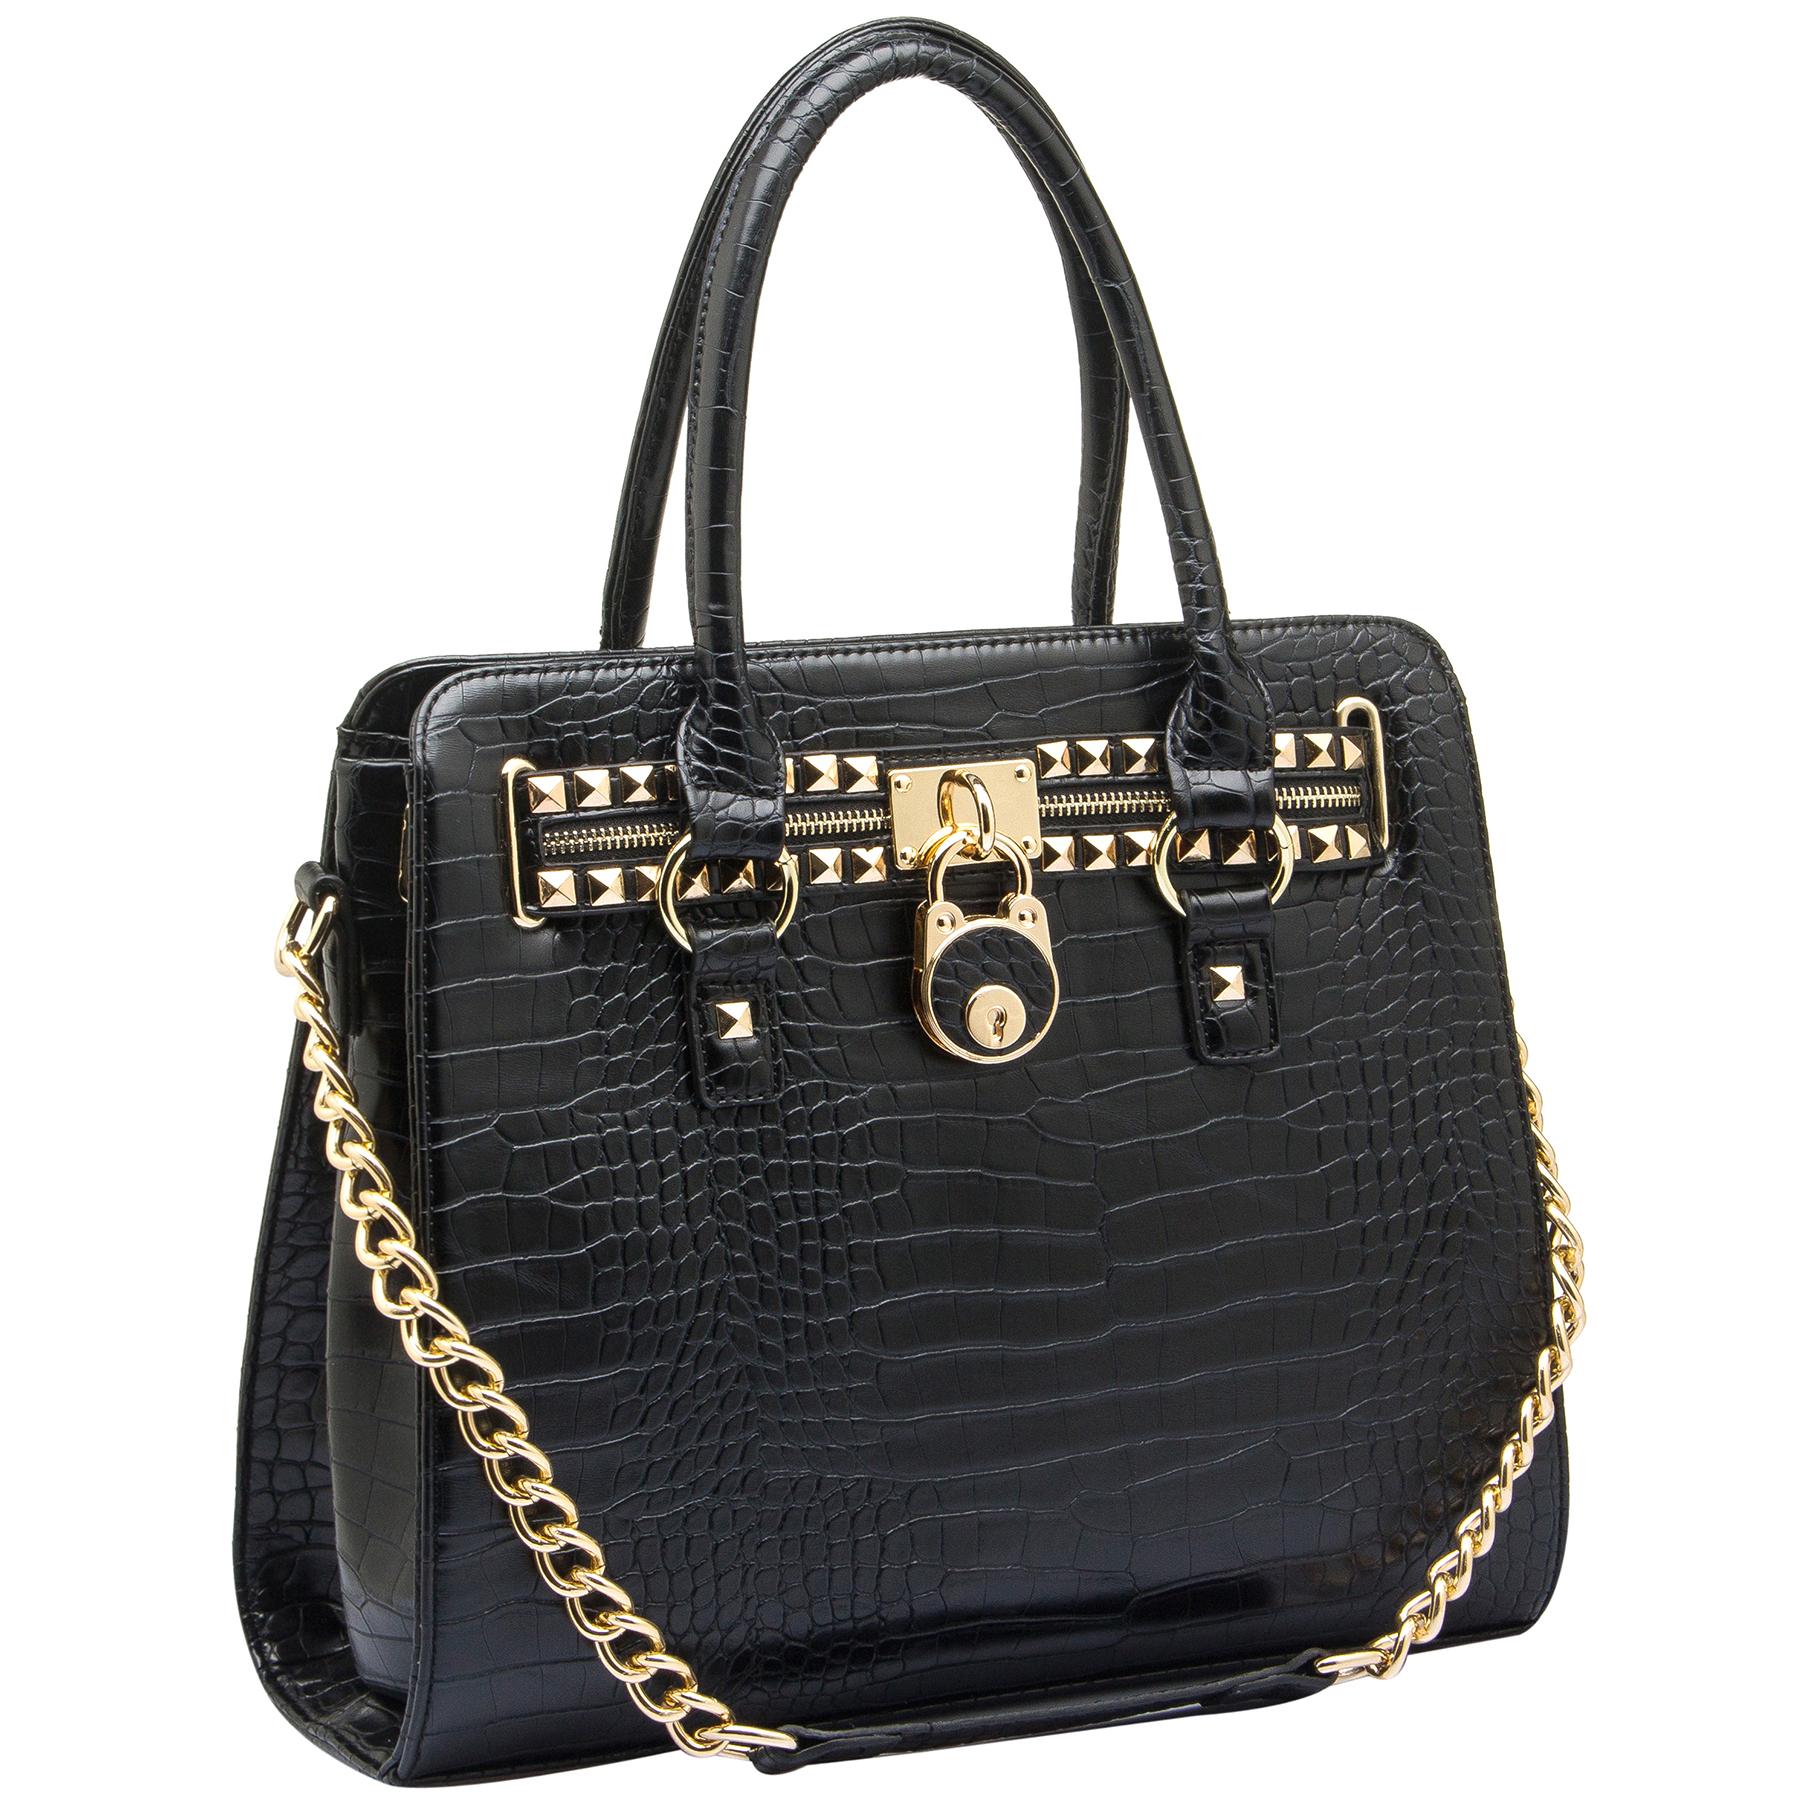 HALEY Black Crocodile Bowler Style Handbag Main